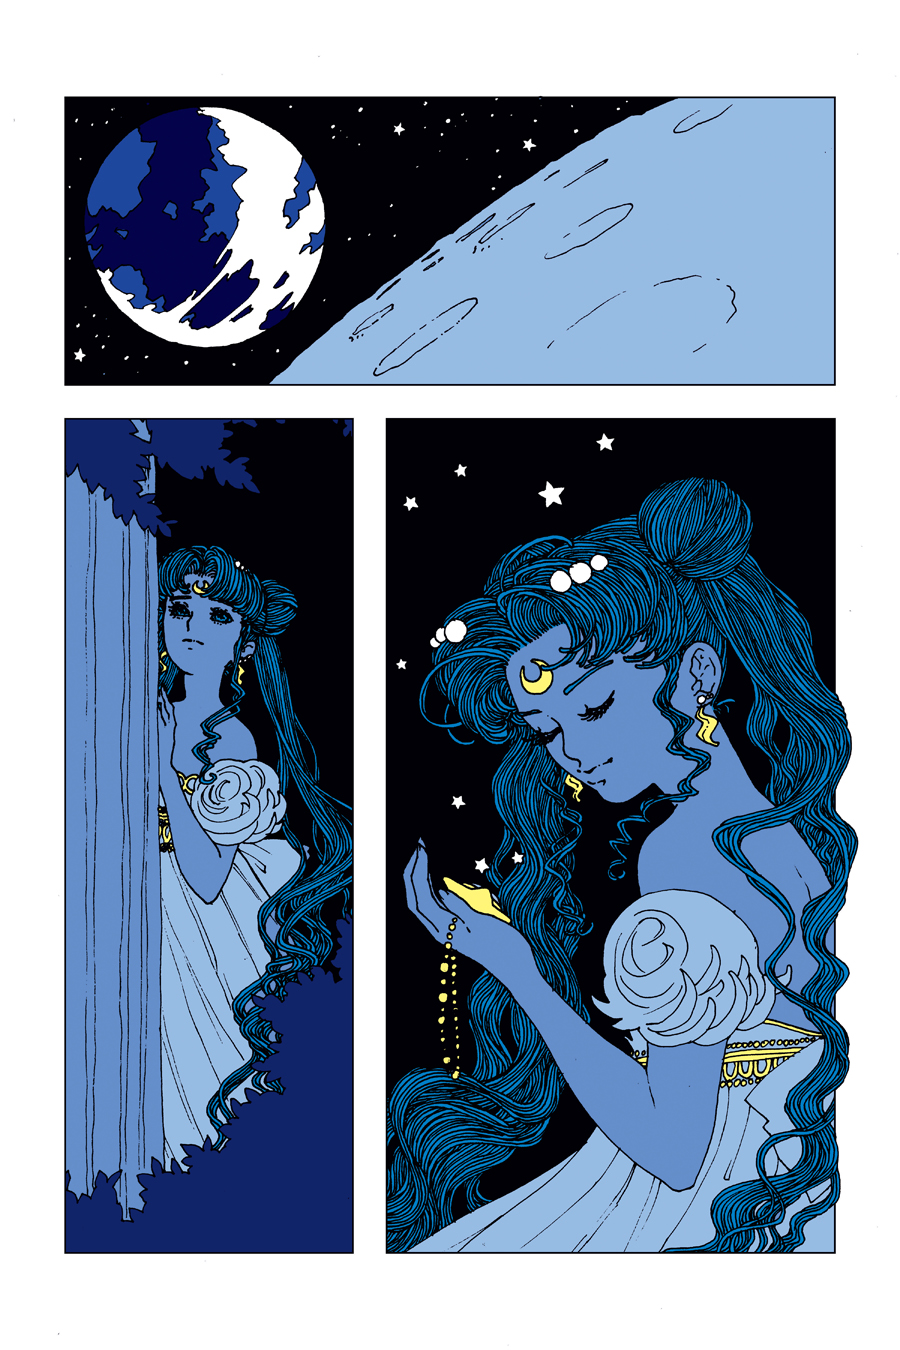 4 serenity sailor moon copy 3.jpg